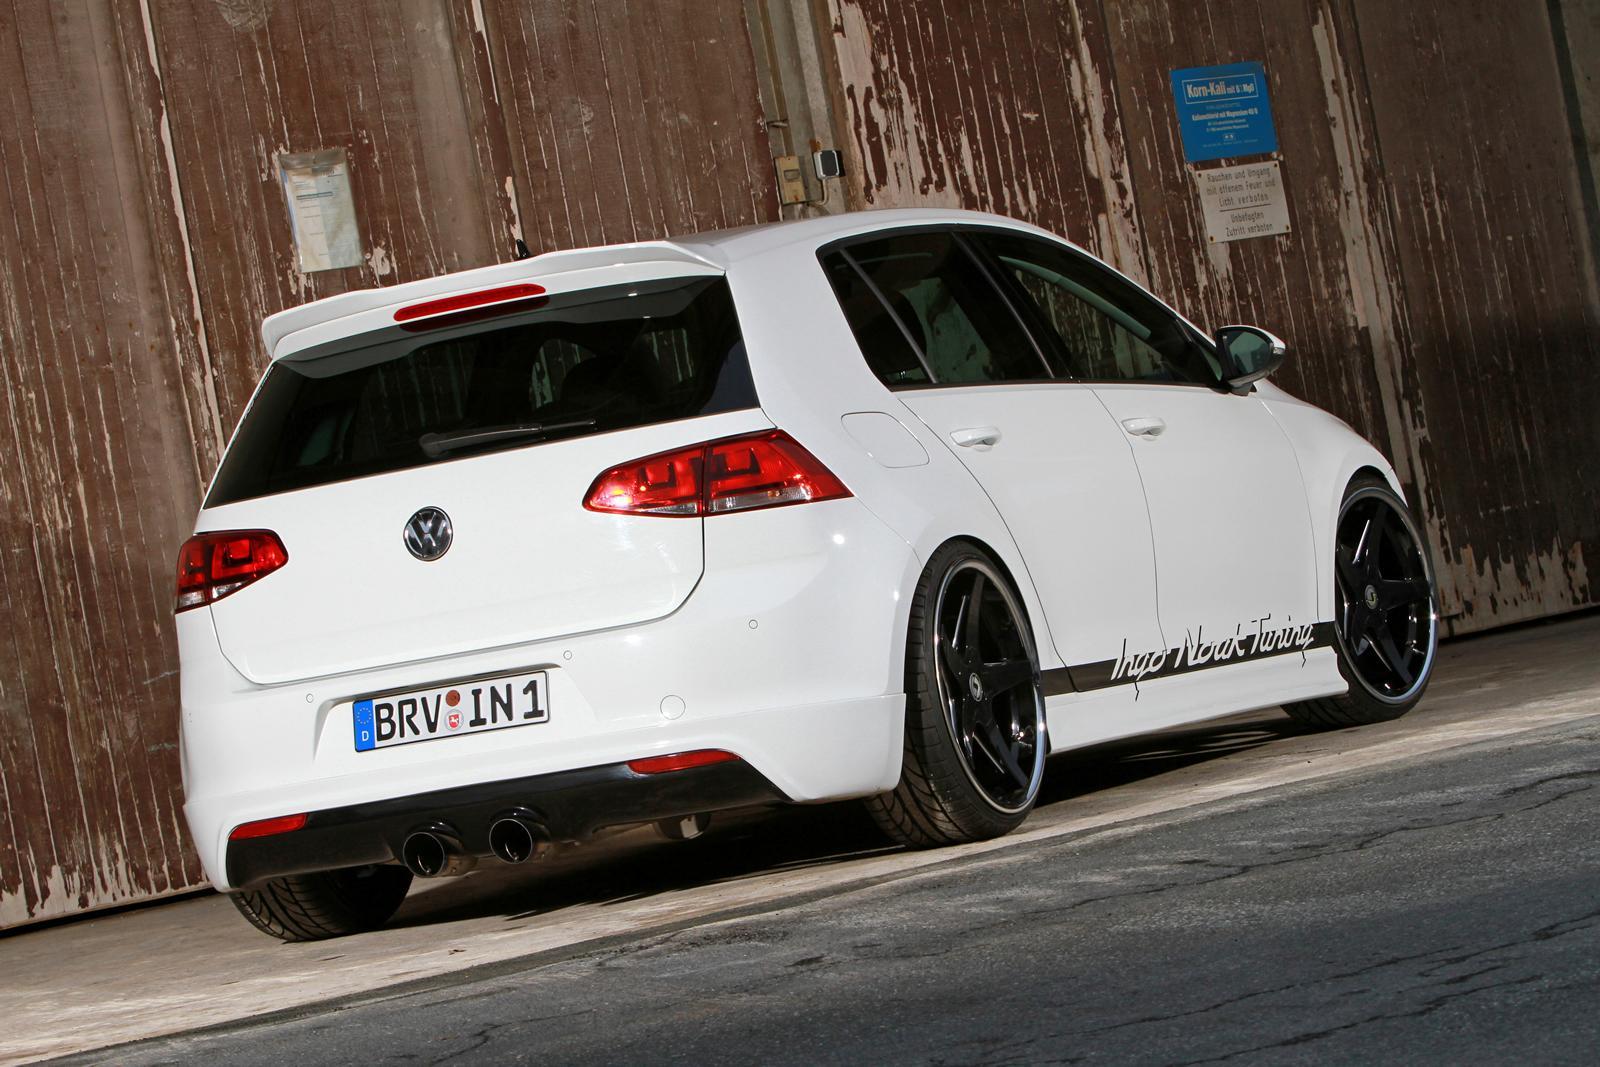 Used volkswagen citi alberton mitula cars - Volkswagen Tuning Ingo Noak Tuned Volkswagen Golf Vii 1 4 Tsi